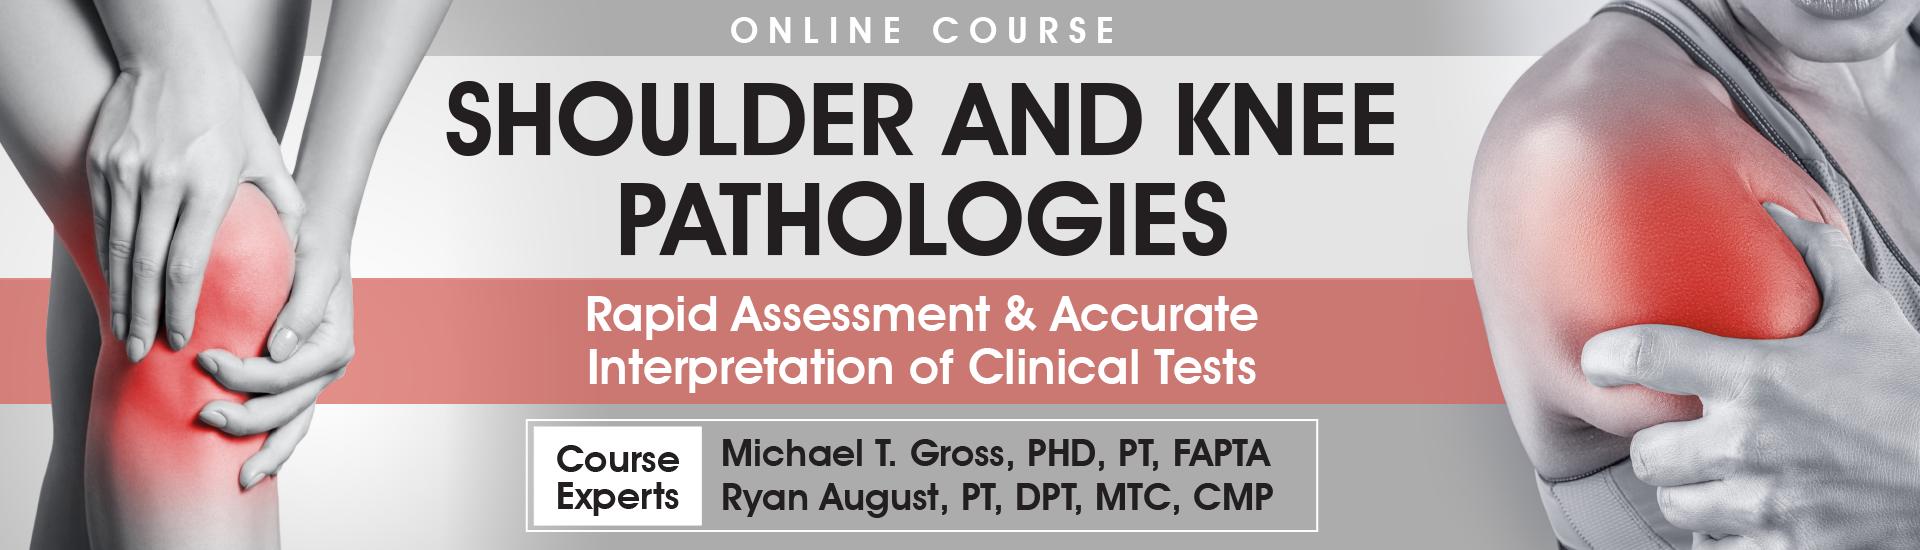 Shoulder and Knee Pathologies Online Course